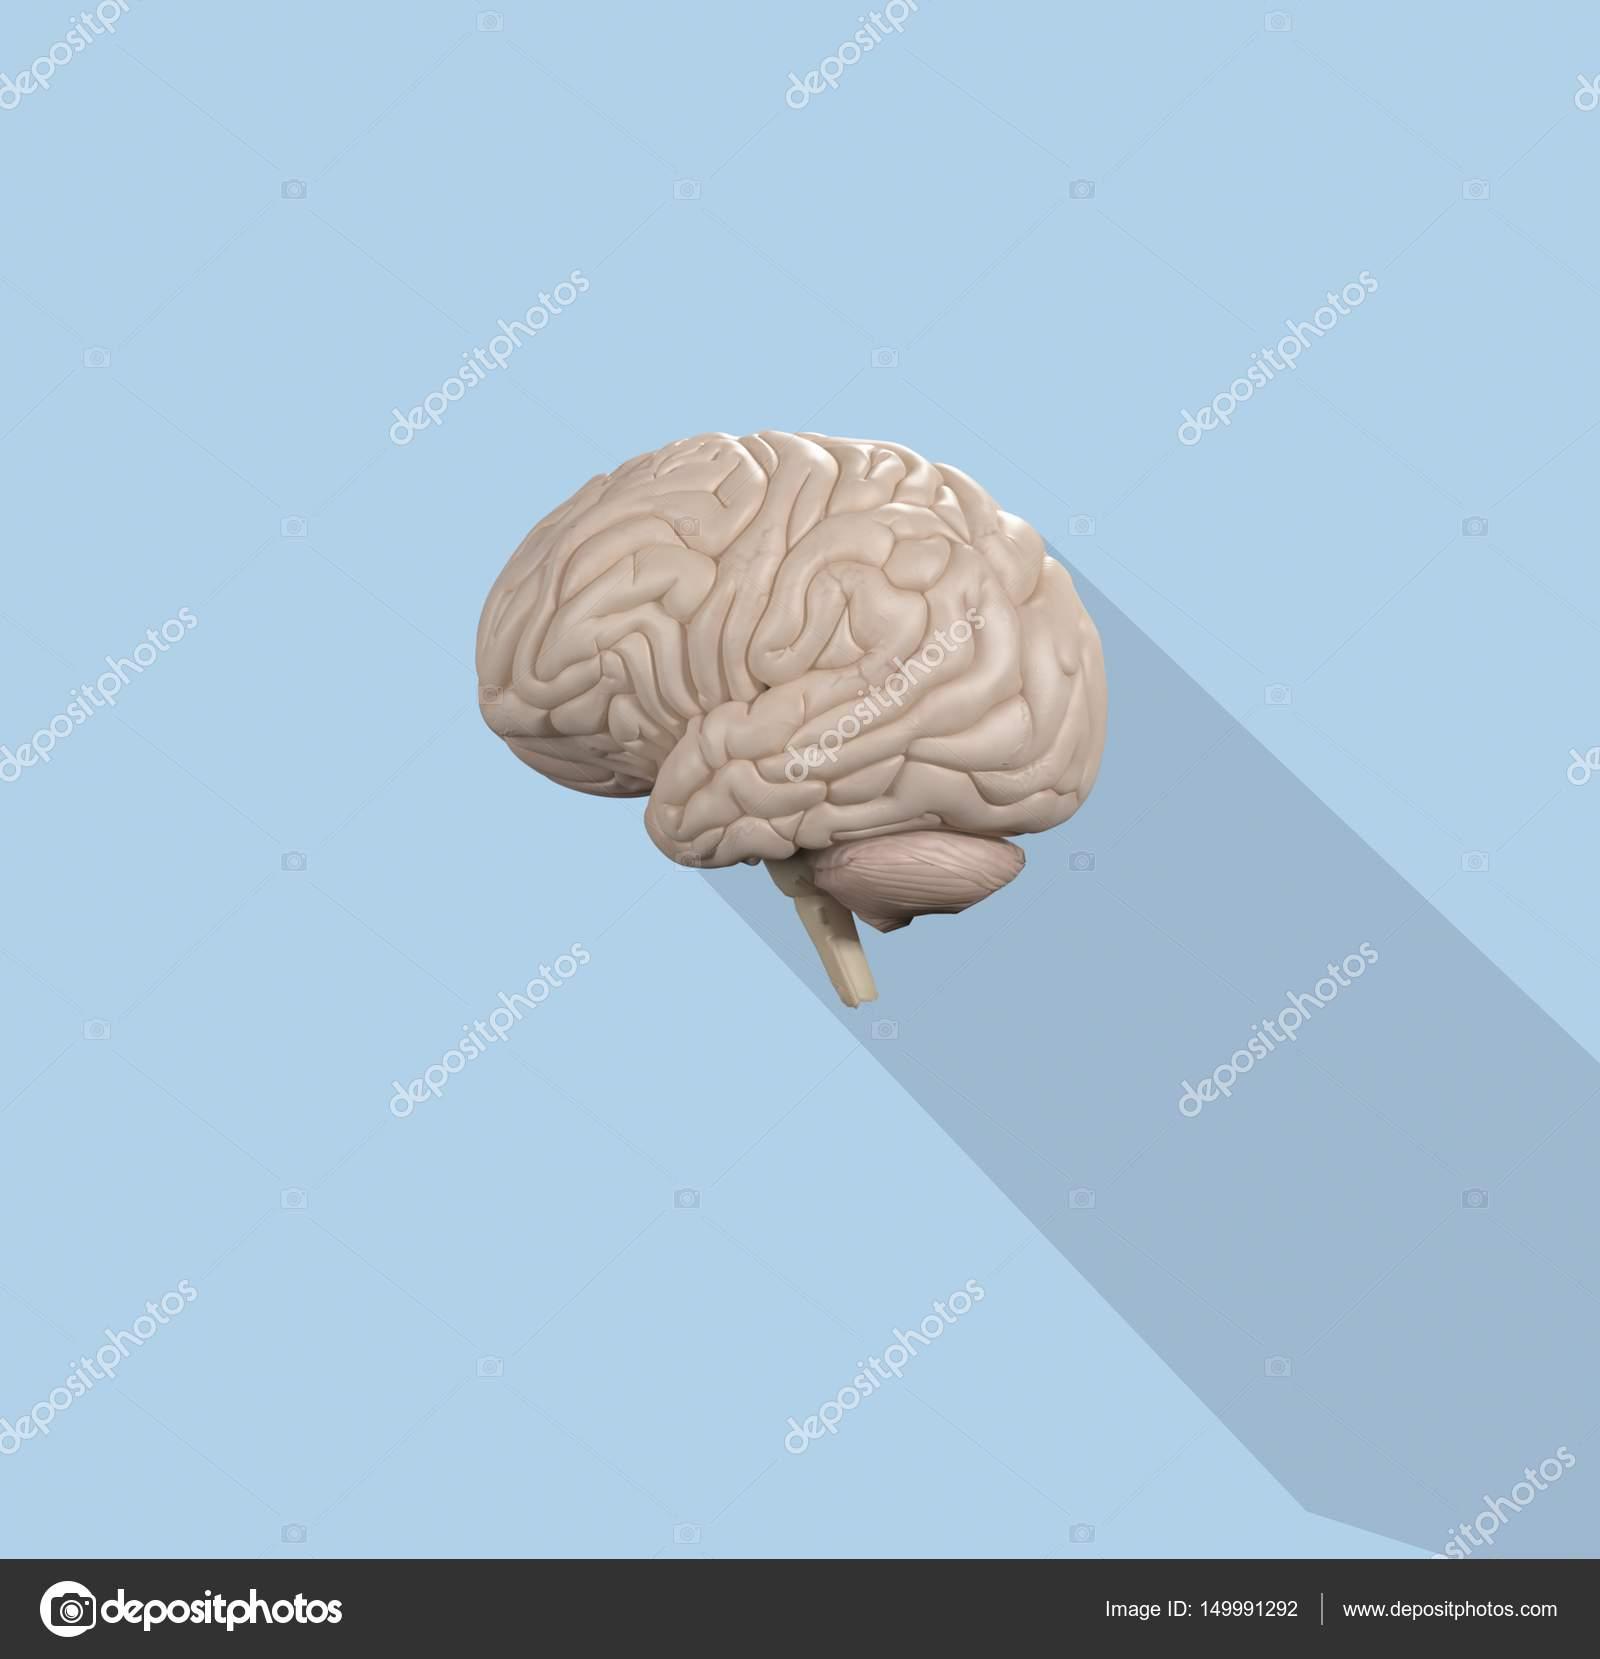 Human brain anatomy model icon — Stock Photo © AnatomyInsider #149991292